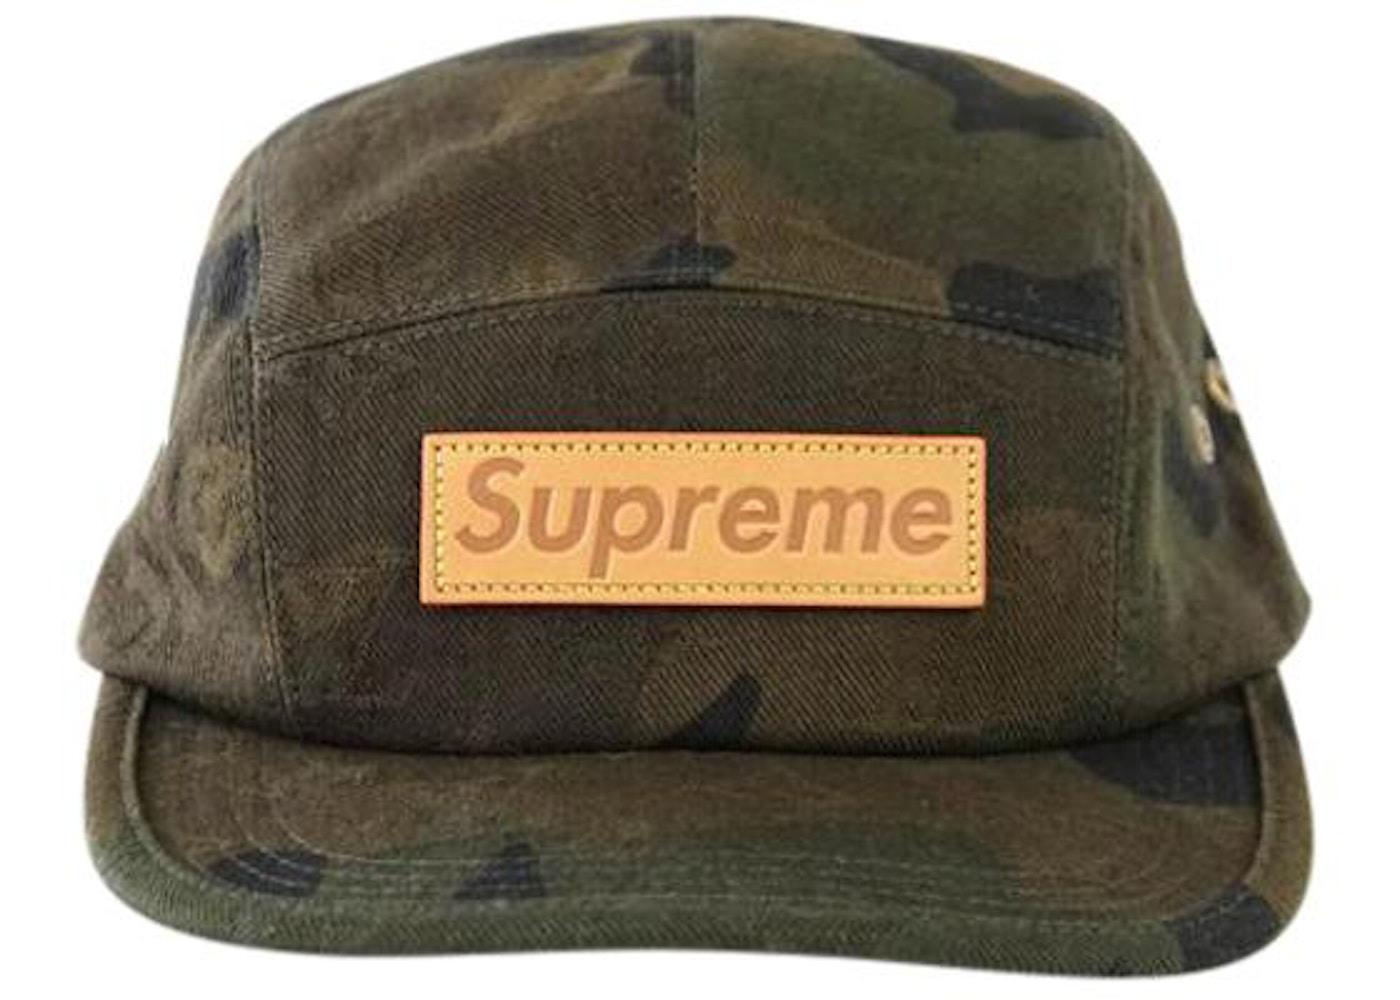 e5a1831045d Streetwear - Supreme Headwear - Highest Bid